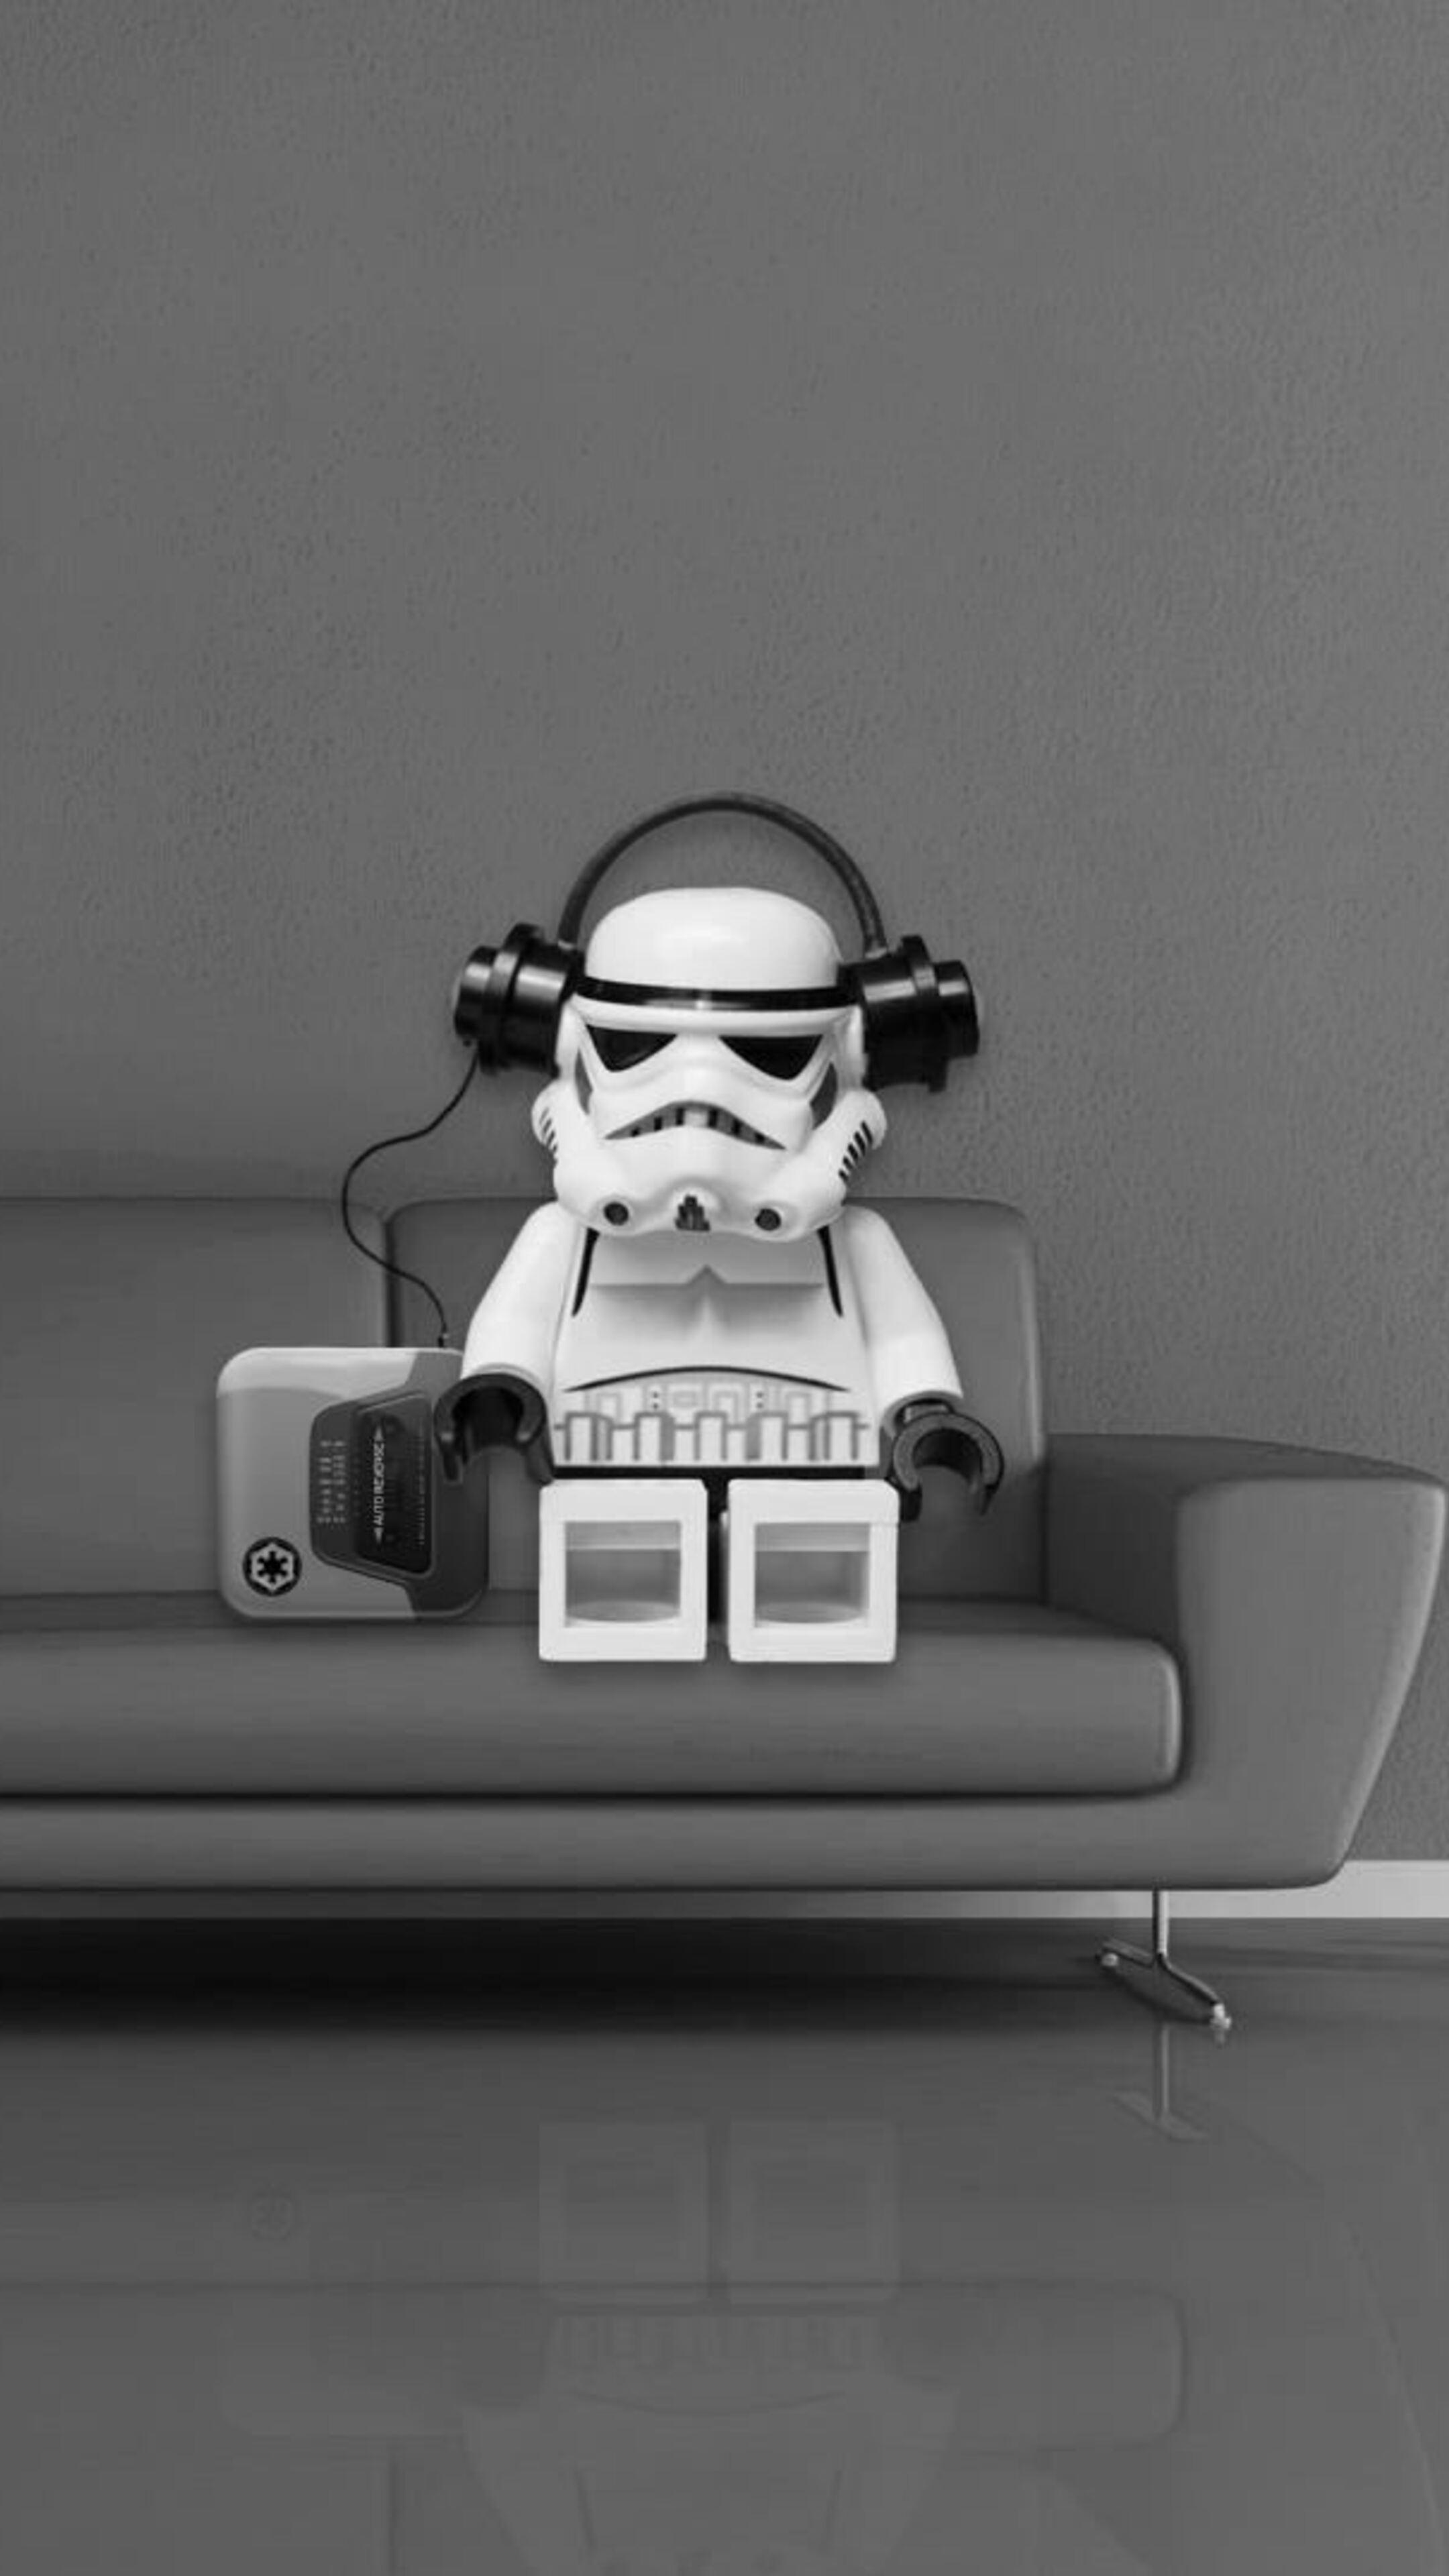 Cute Wallpaper For Computer Food 2160x3840 Stormtrooper Lego Star Wars Sony Xperia X Xz Z5